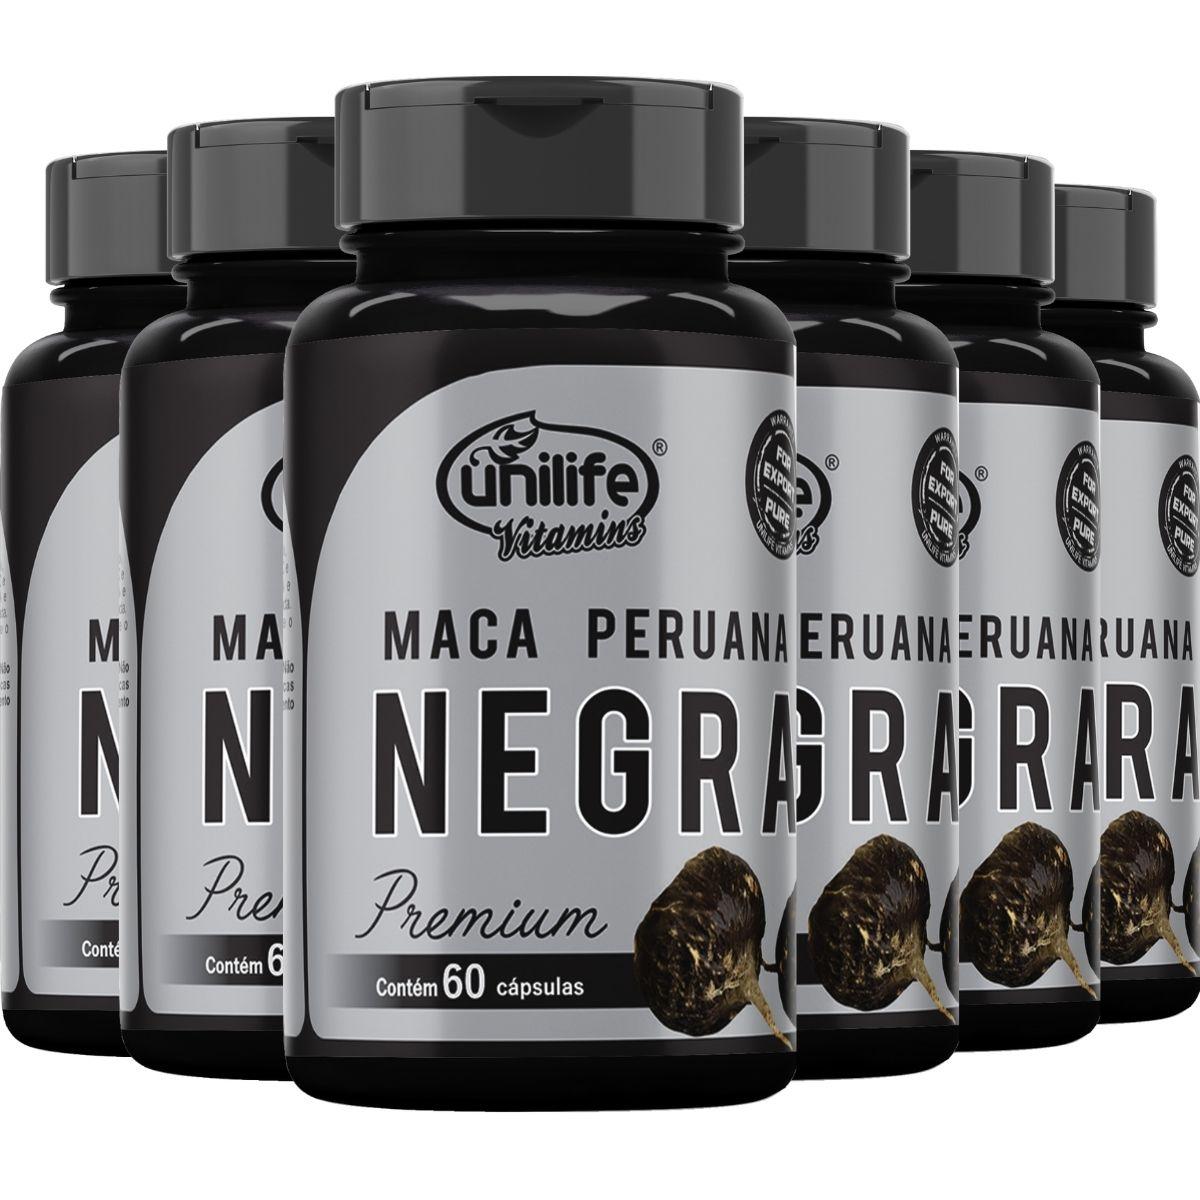 Kit 6 Maca Peruana Negra Premium Pura 450mg 60 Cápsulas - Unilife